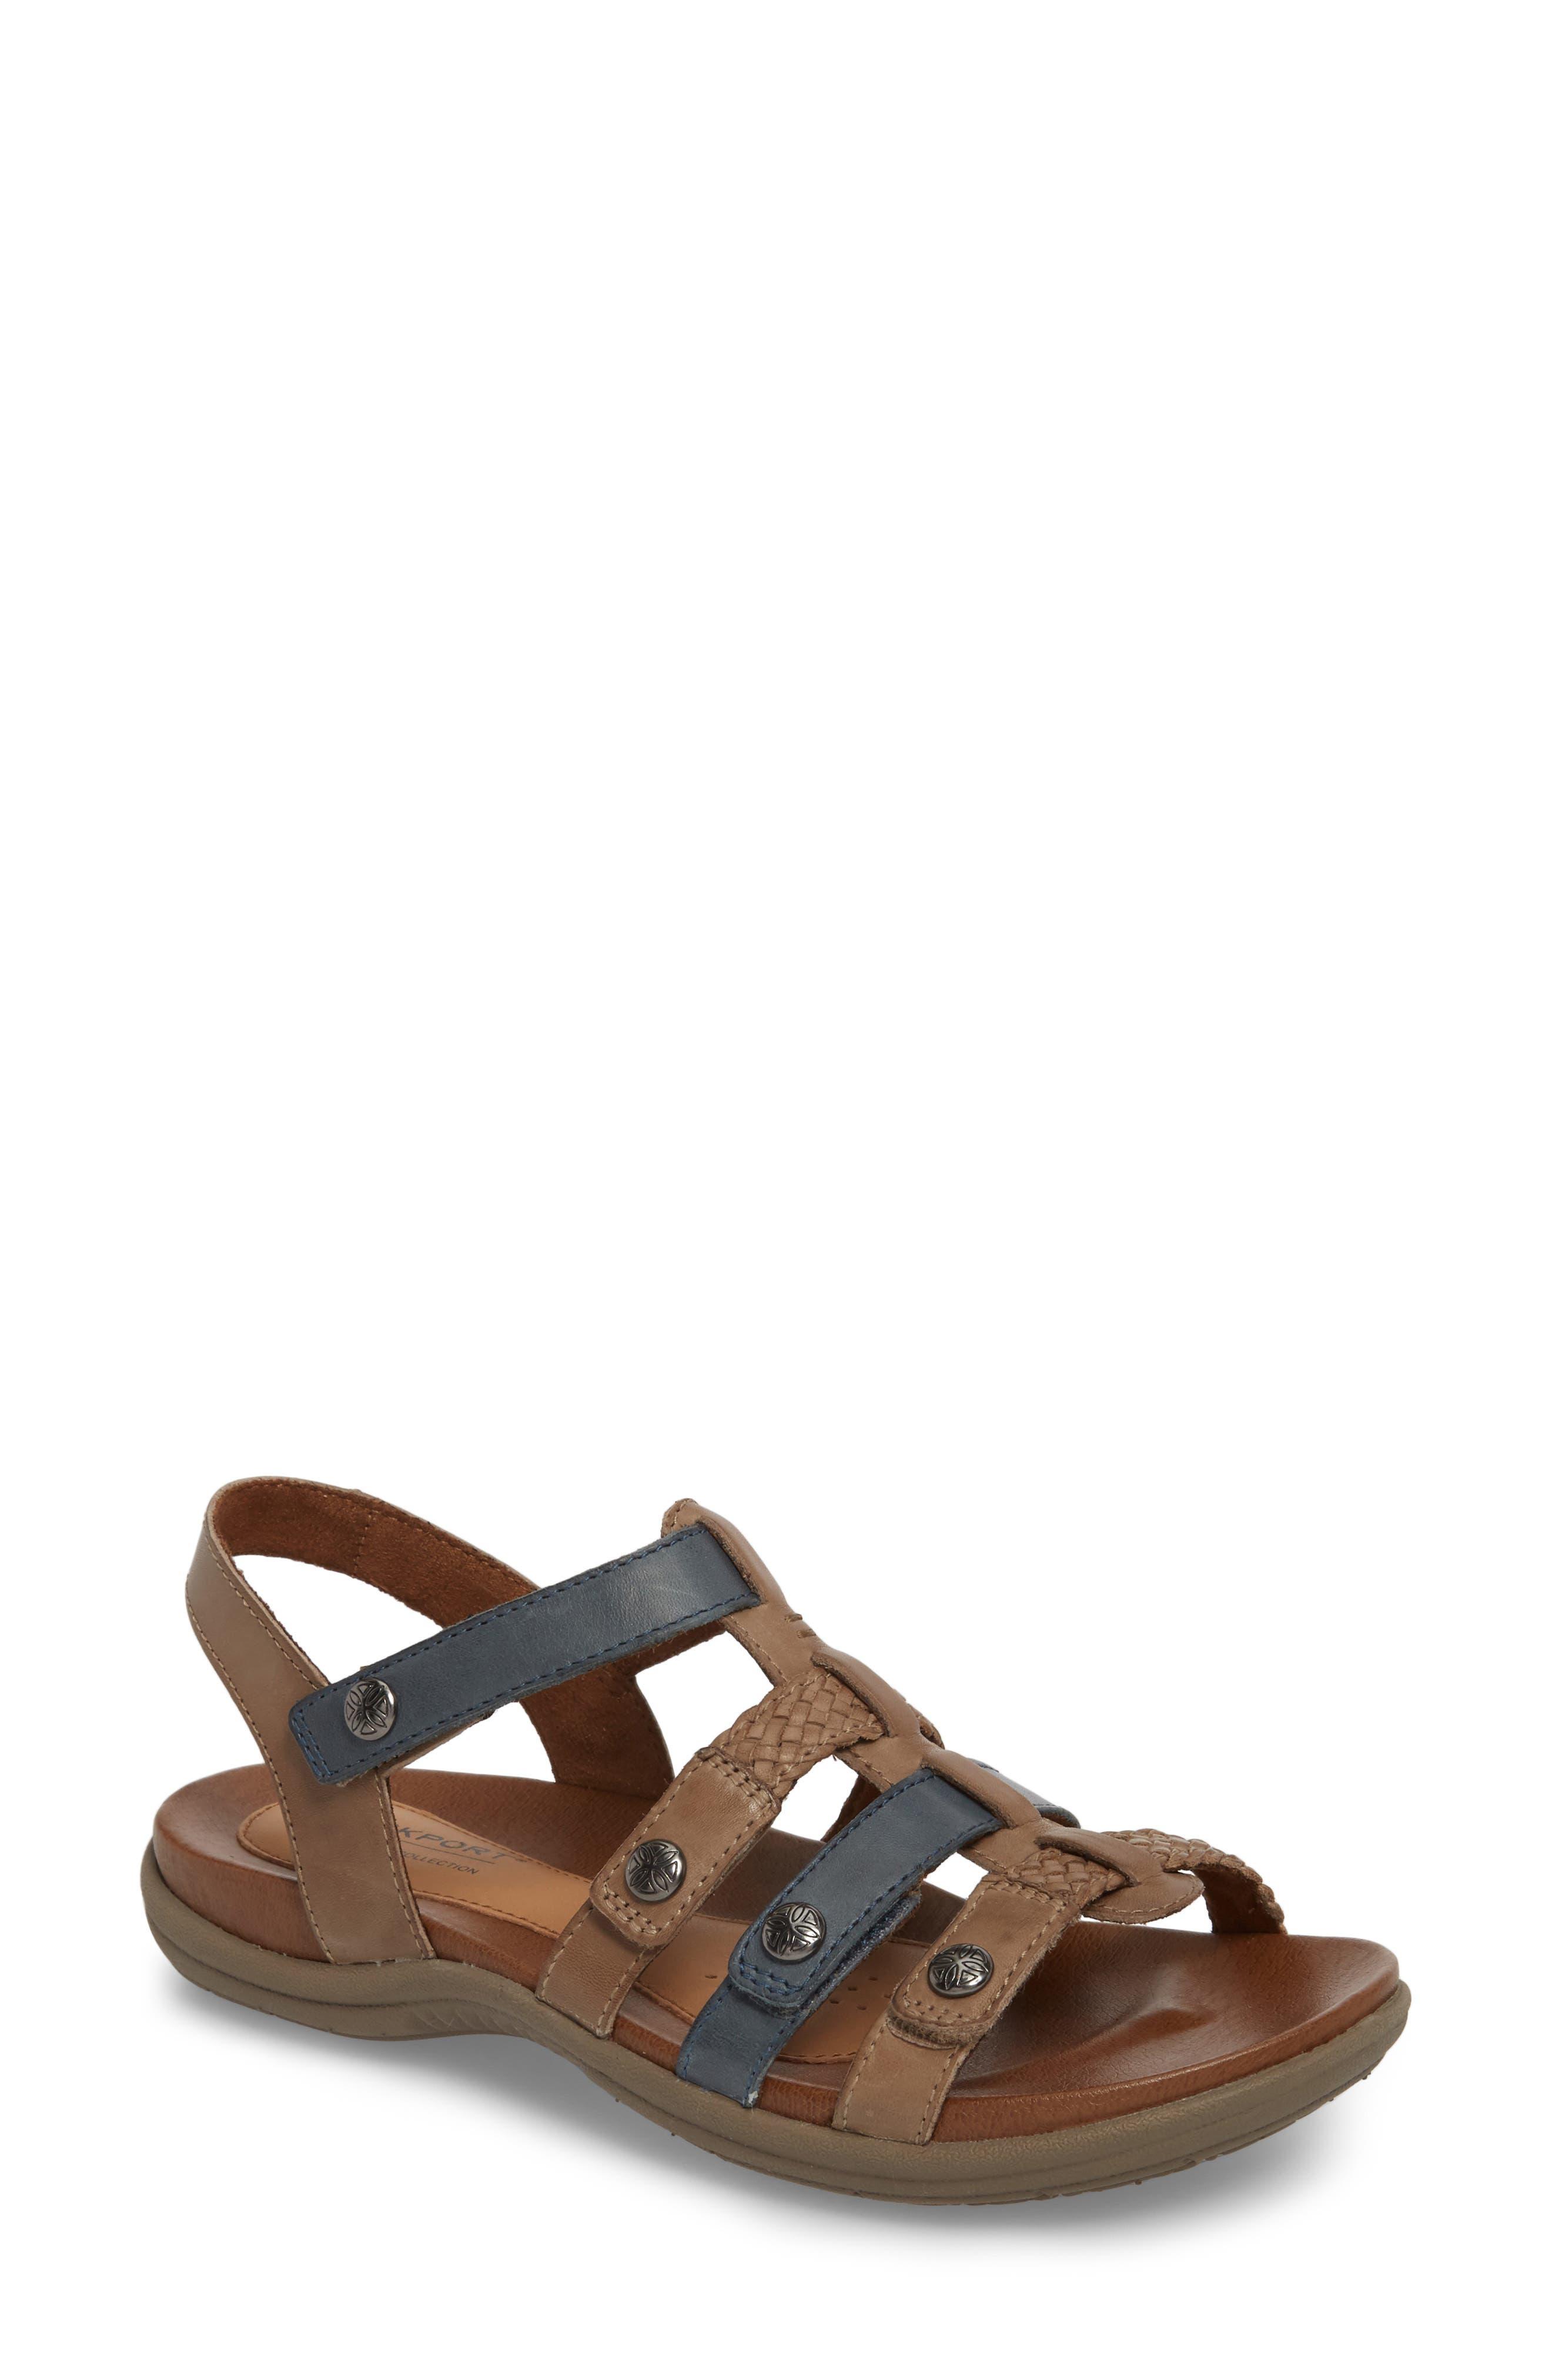 Rubey T-Strap Sandal,                         Main,                         color, 262